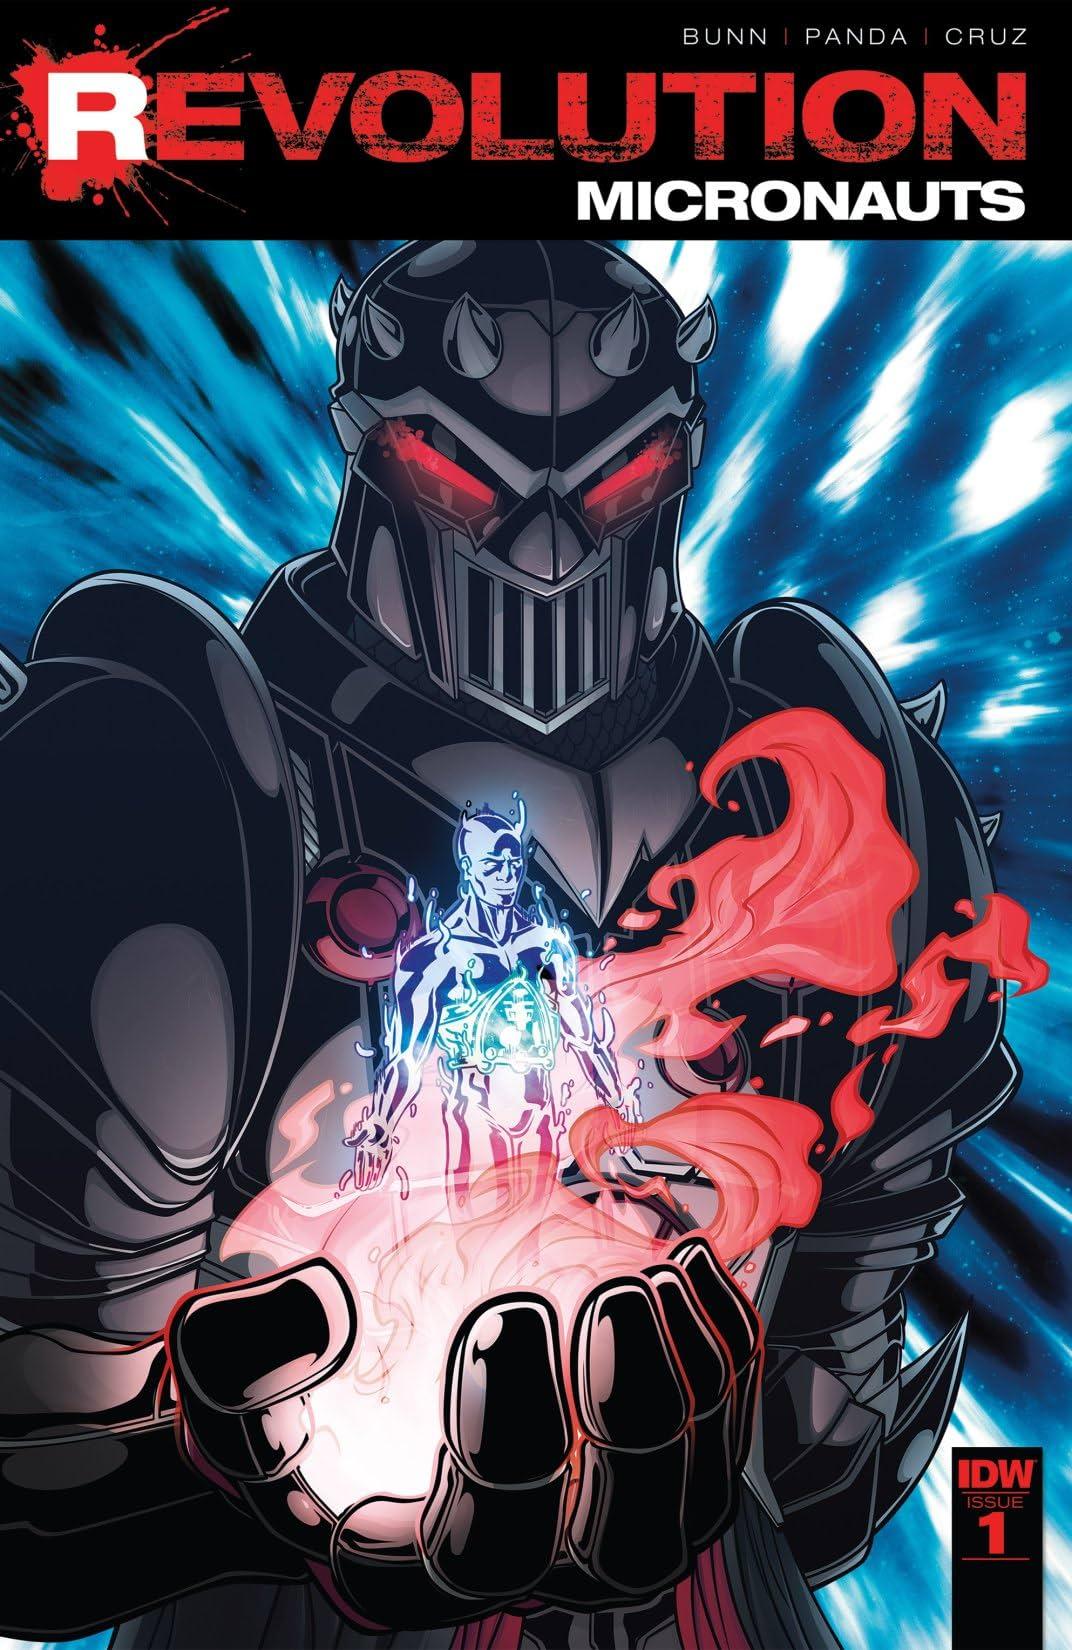 Micronauts: Revolution #1